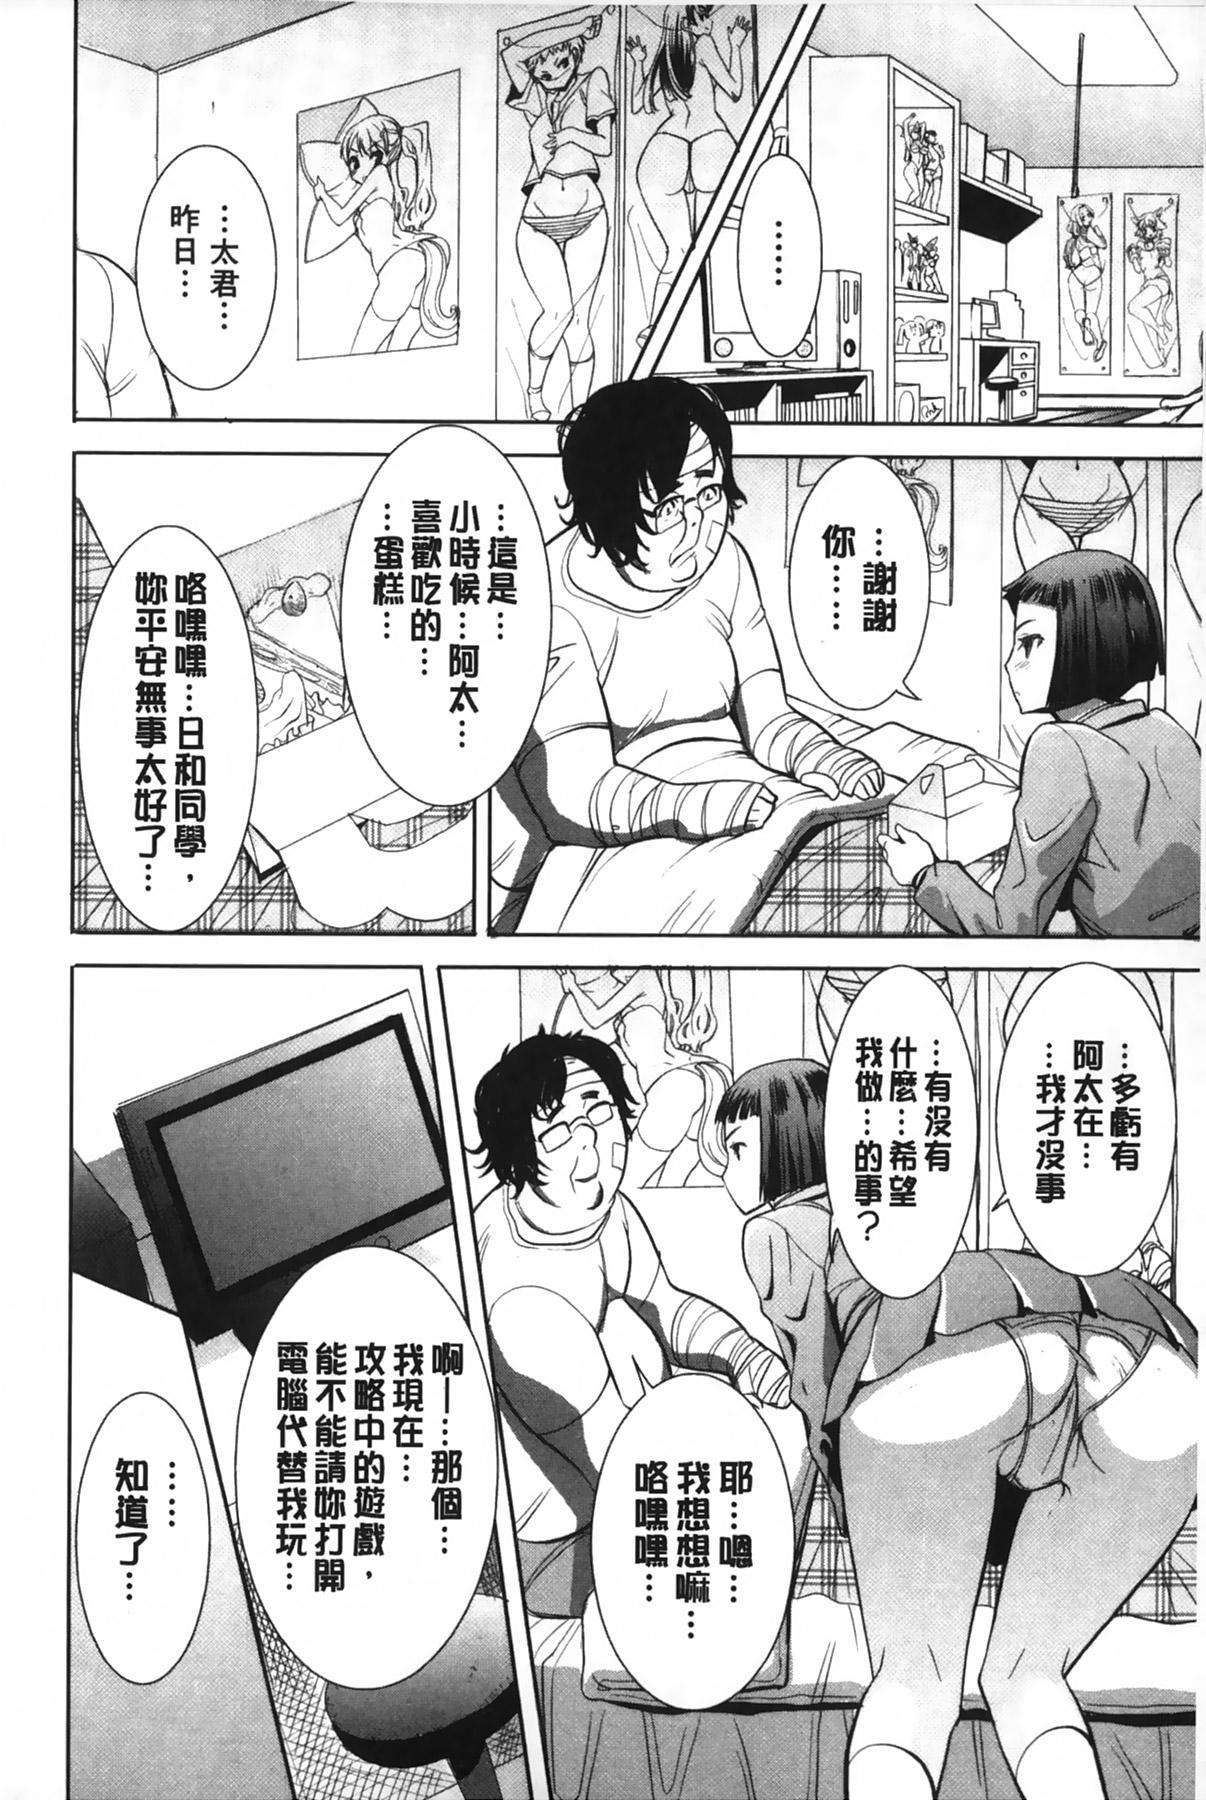 Ane Unsweet - Mihiragi Hiyori + | 姊姊不甜美 彌平木日和+ 16